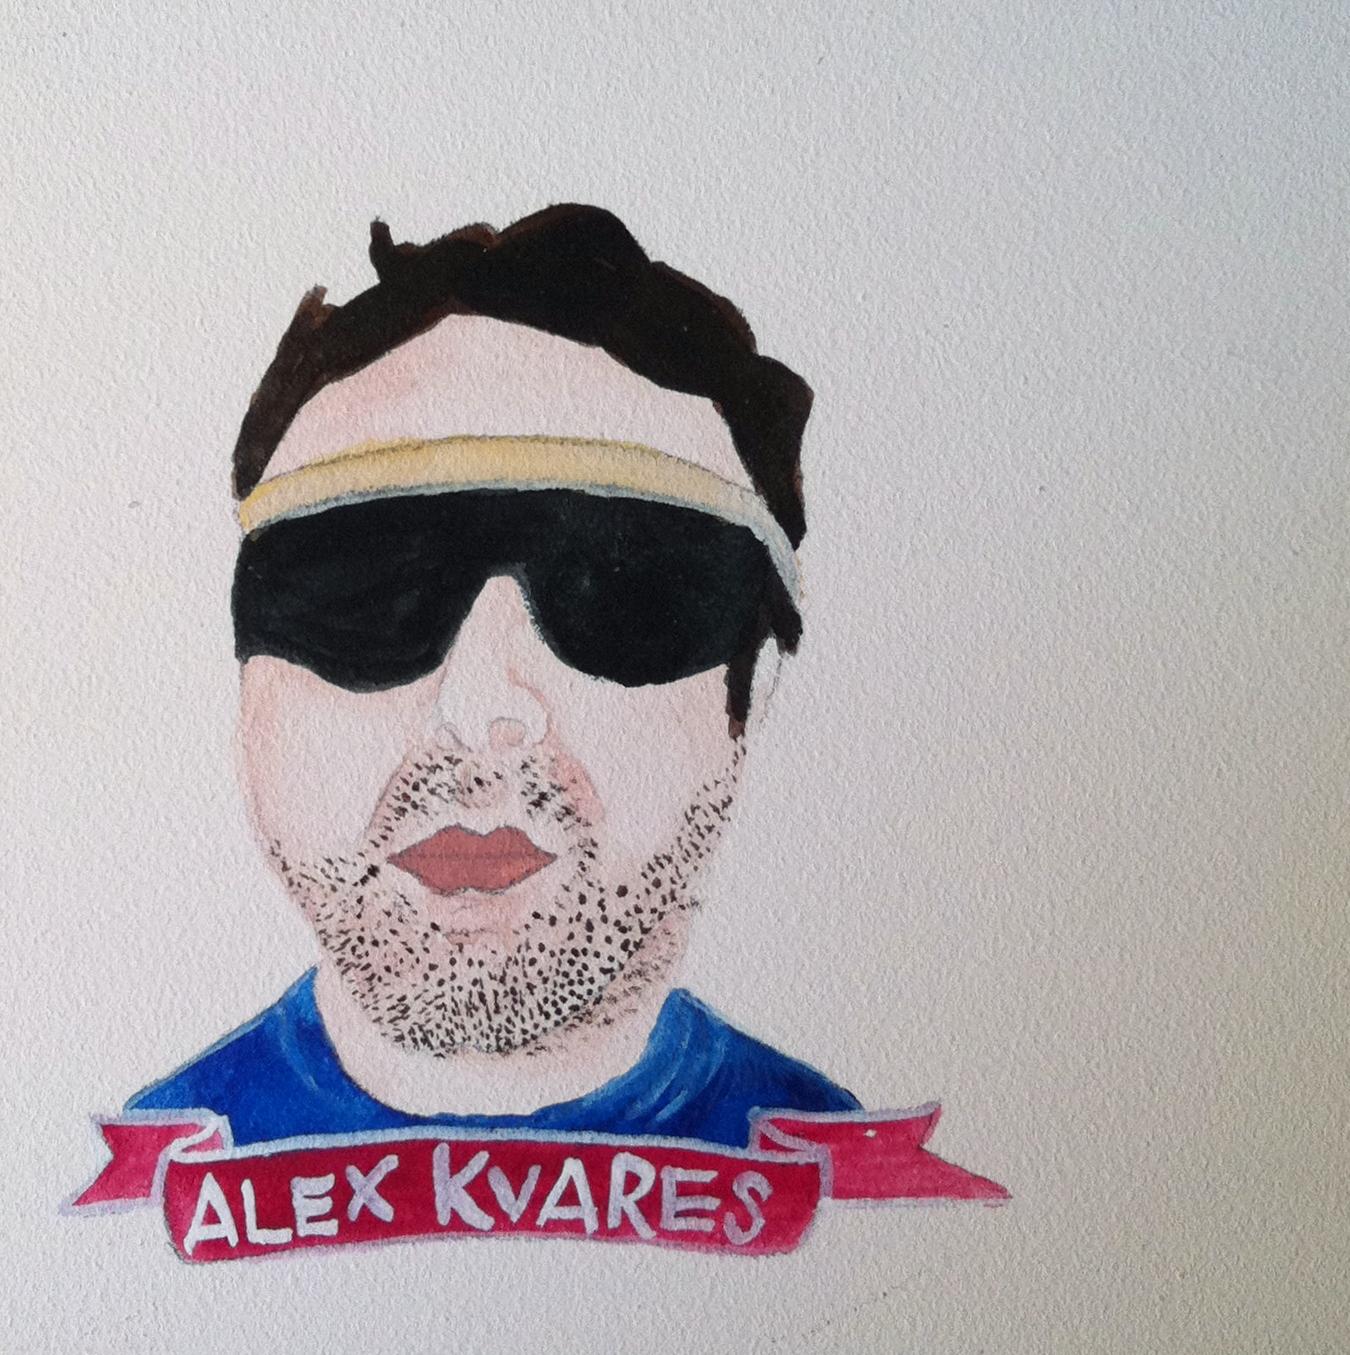 Talent Loves Company at Barbara Archer Gallery: 365 portraits by Lydia Walls - Alex Kvares